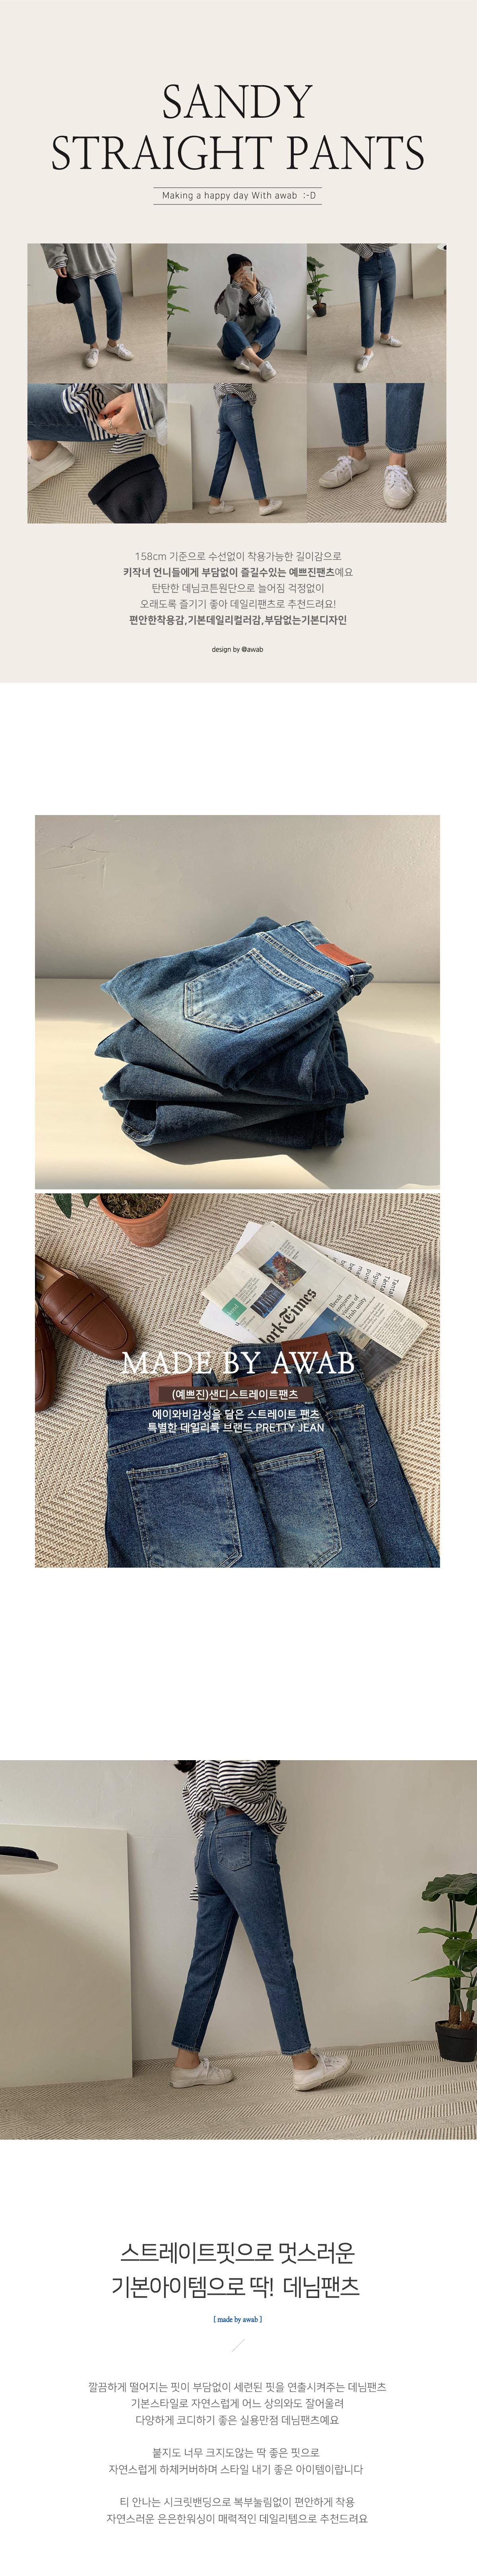 Sandy straight pants